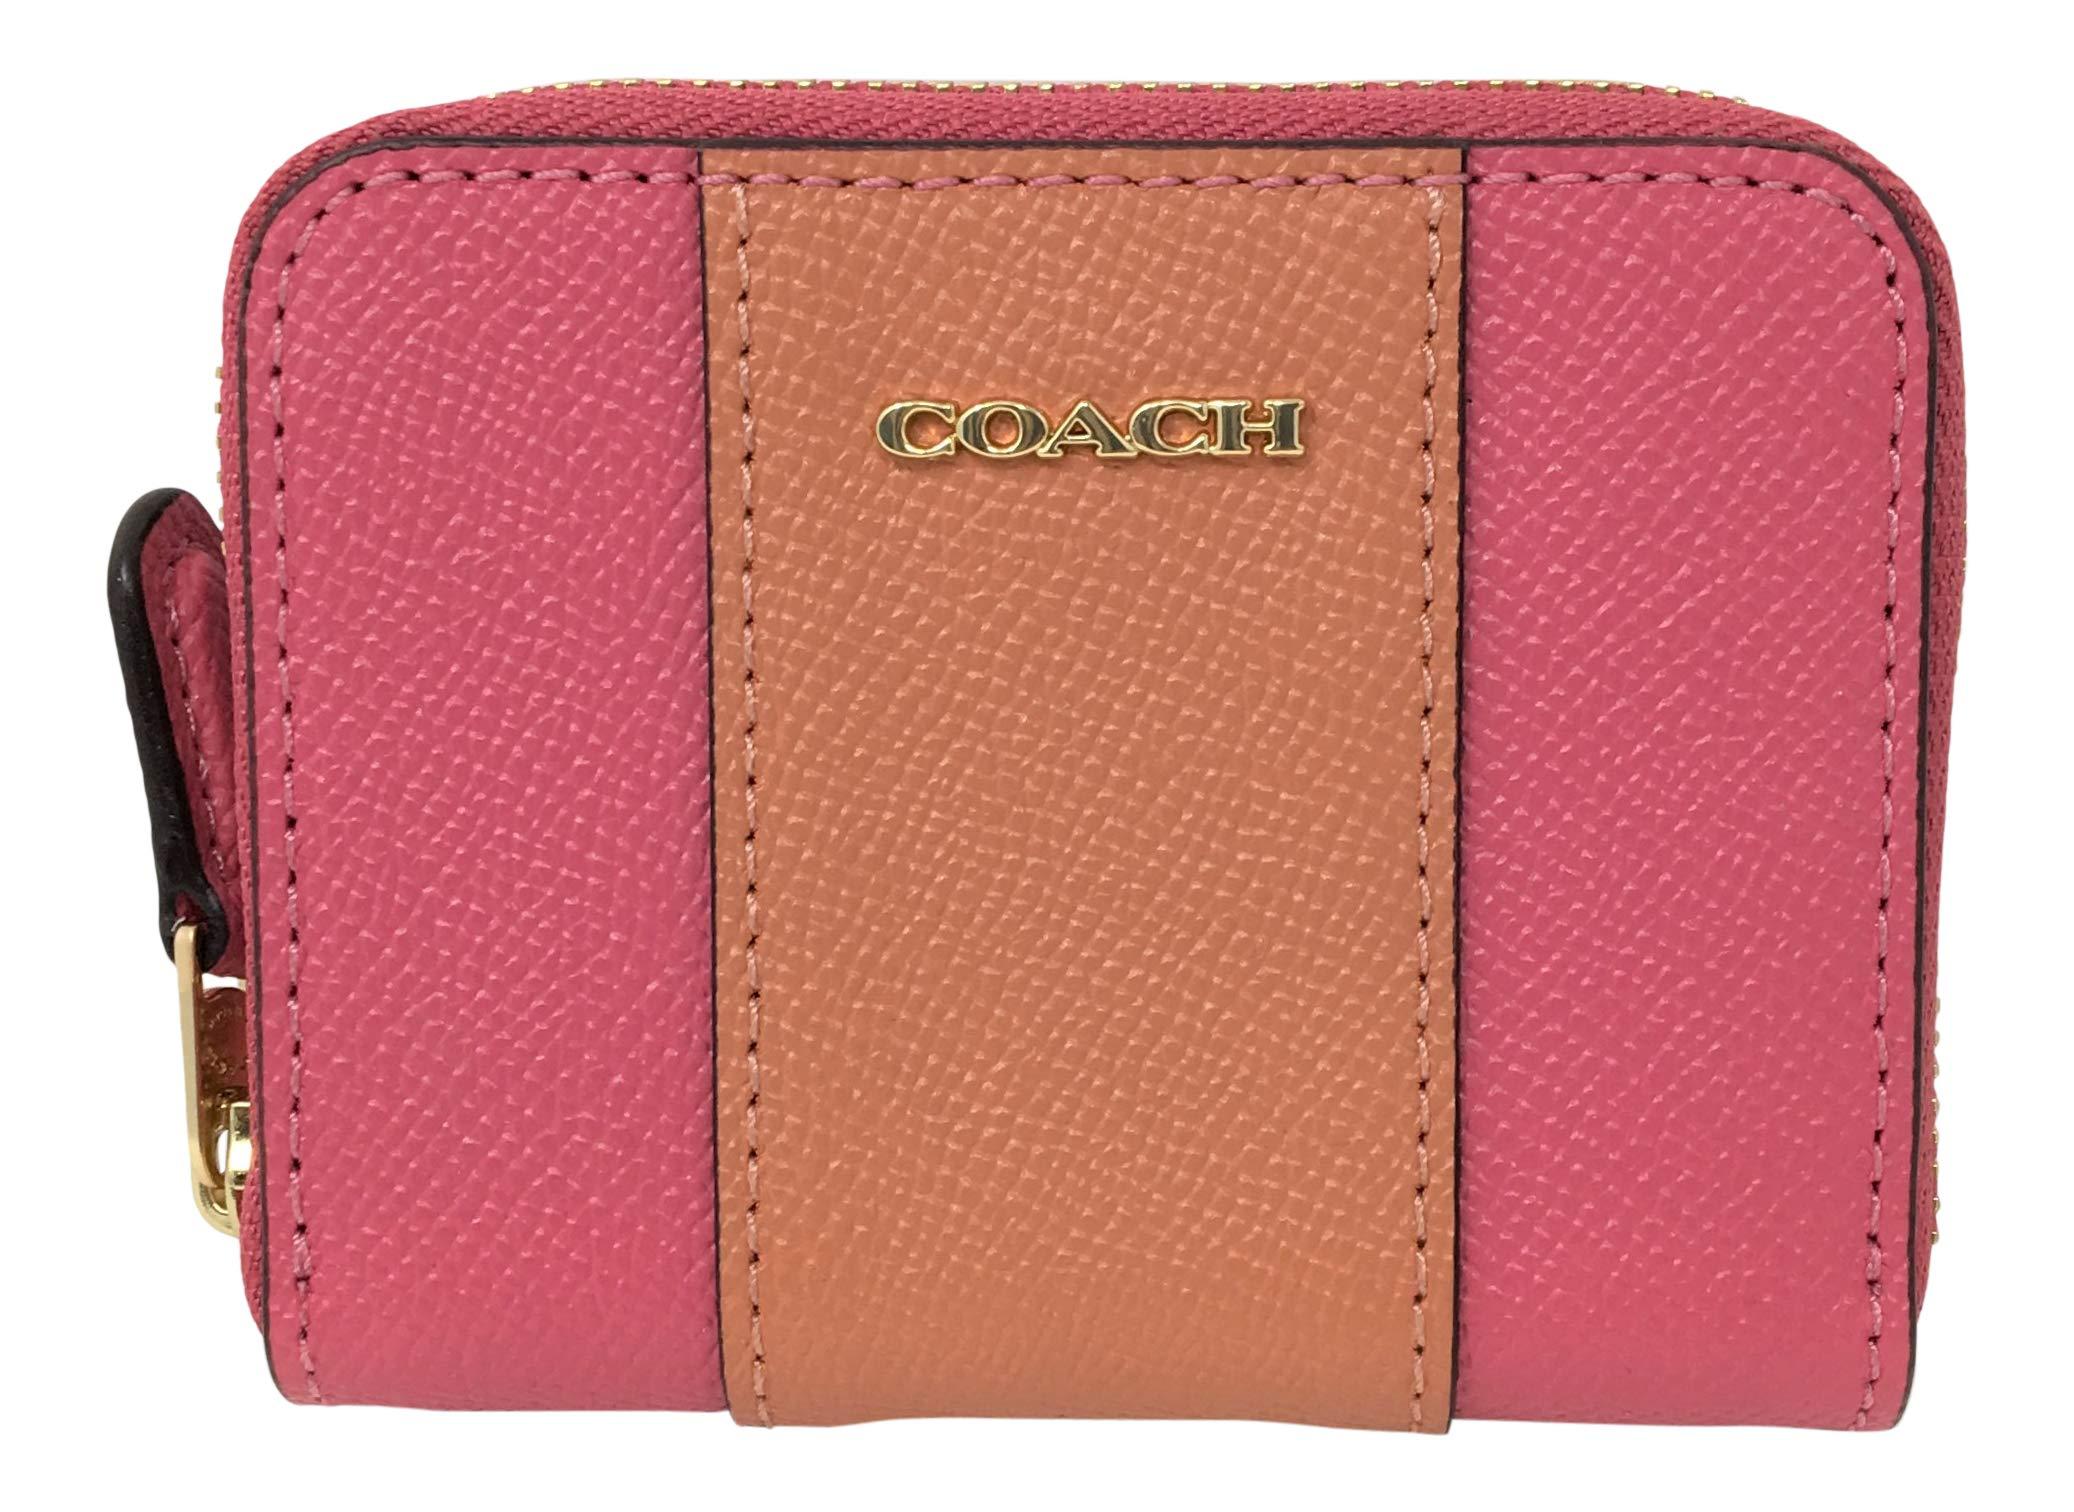 Coach Mini Zip Around Card Case in Crossgrain Leather Pink Ruby F68623